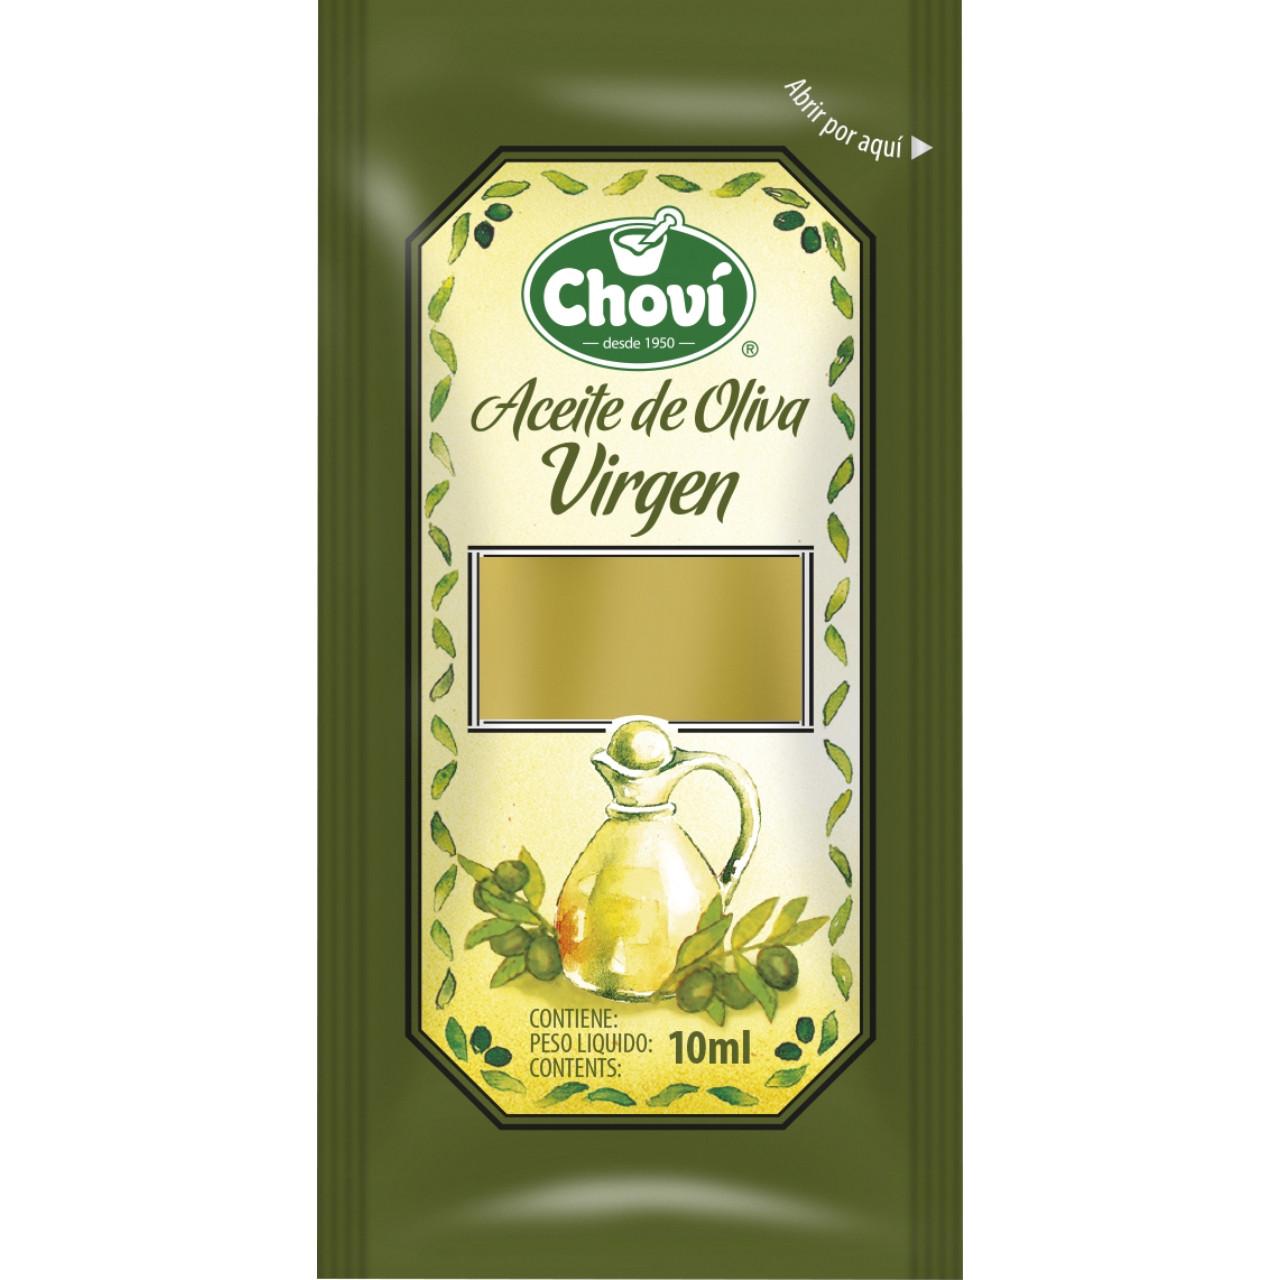 Oli oliva verge extra sobre Chovi